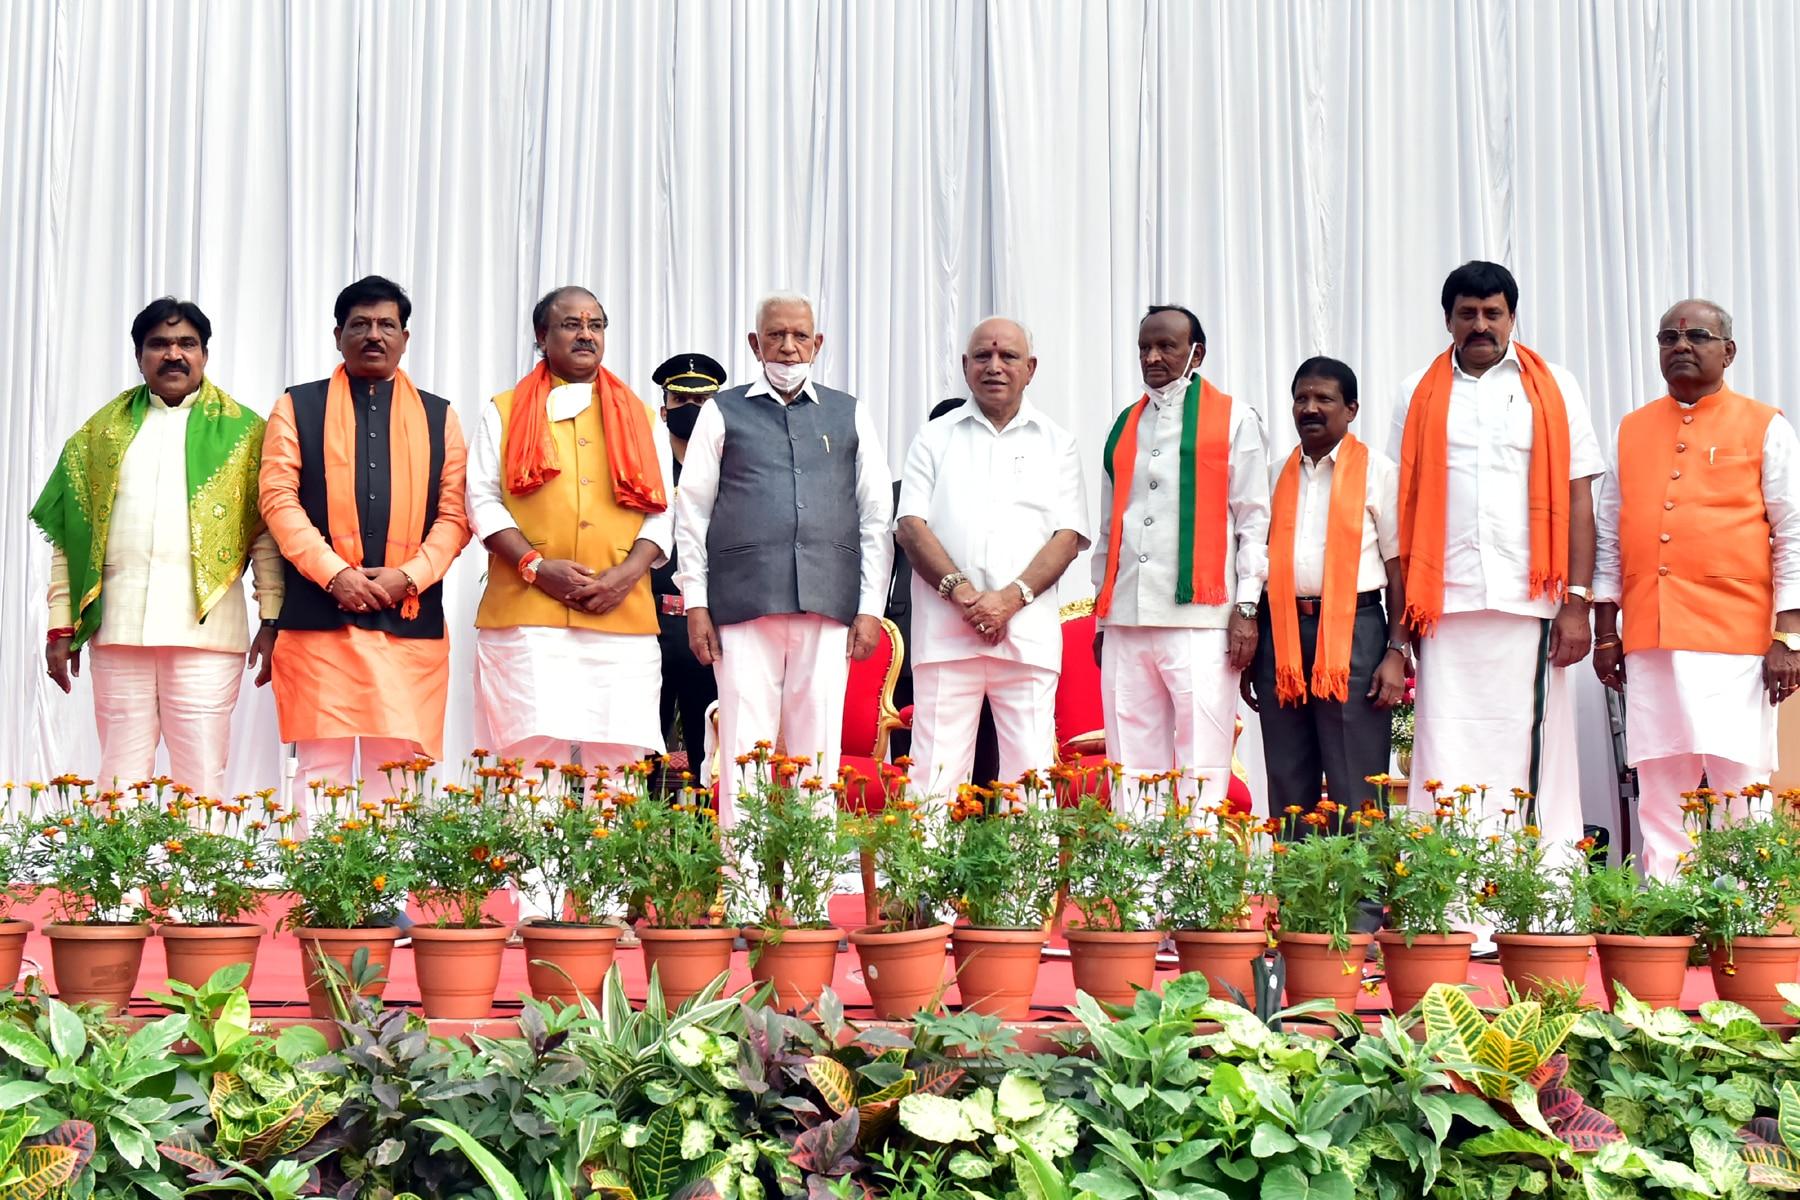 BJP: ನೂತನ ಸಚಿವರಿಗೆ ಬಹುತೇಕ ಖಾತೆ ಫೈನಲ್! ನಾಳೆ ಖಾತೆ ಹಂಚಿಕೆ: ಯಾರಿಗೆ ಯಾವ ಖಾತೆ?